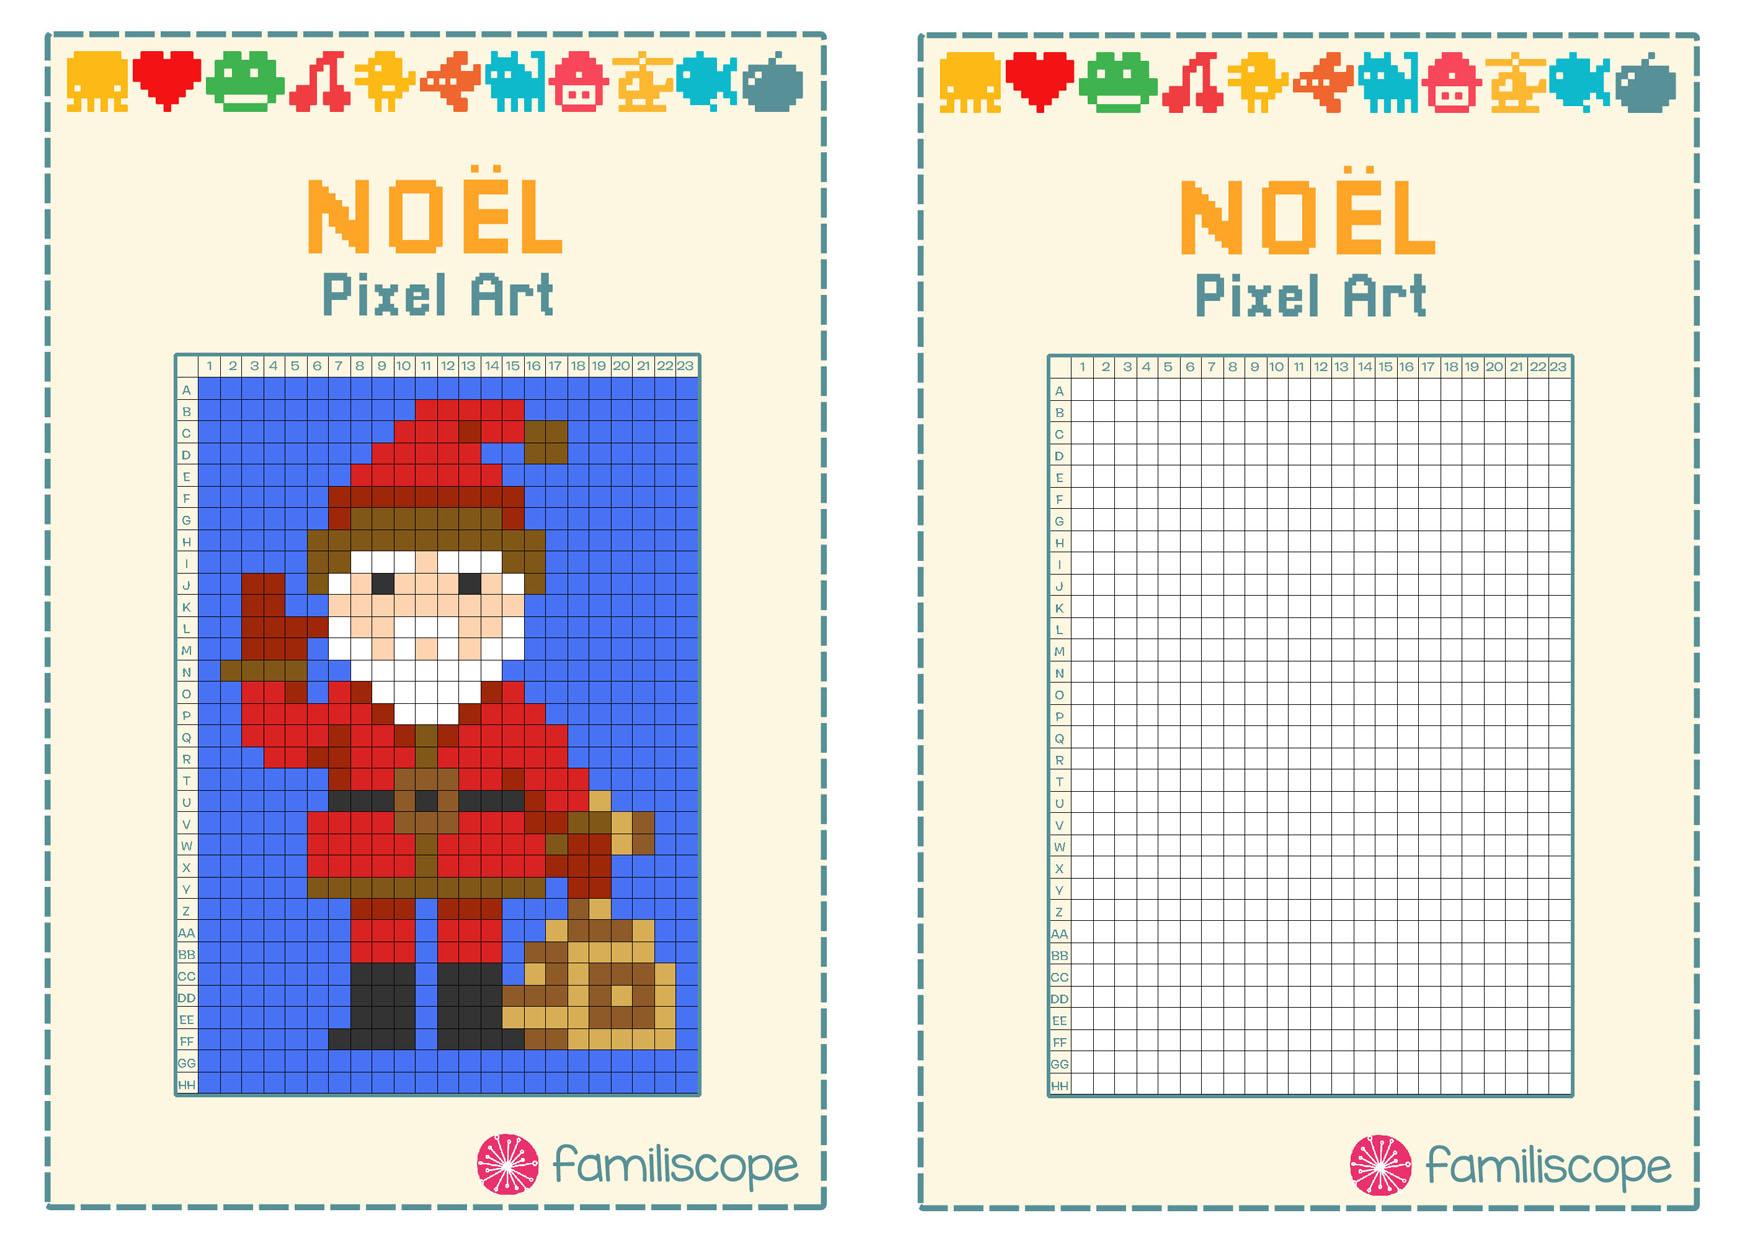 Pixel Art Noël : Père Noël avec Pixel Art Pere Noel